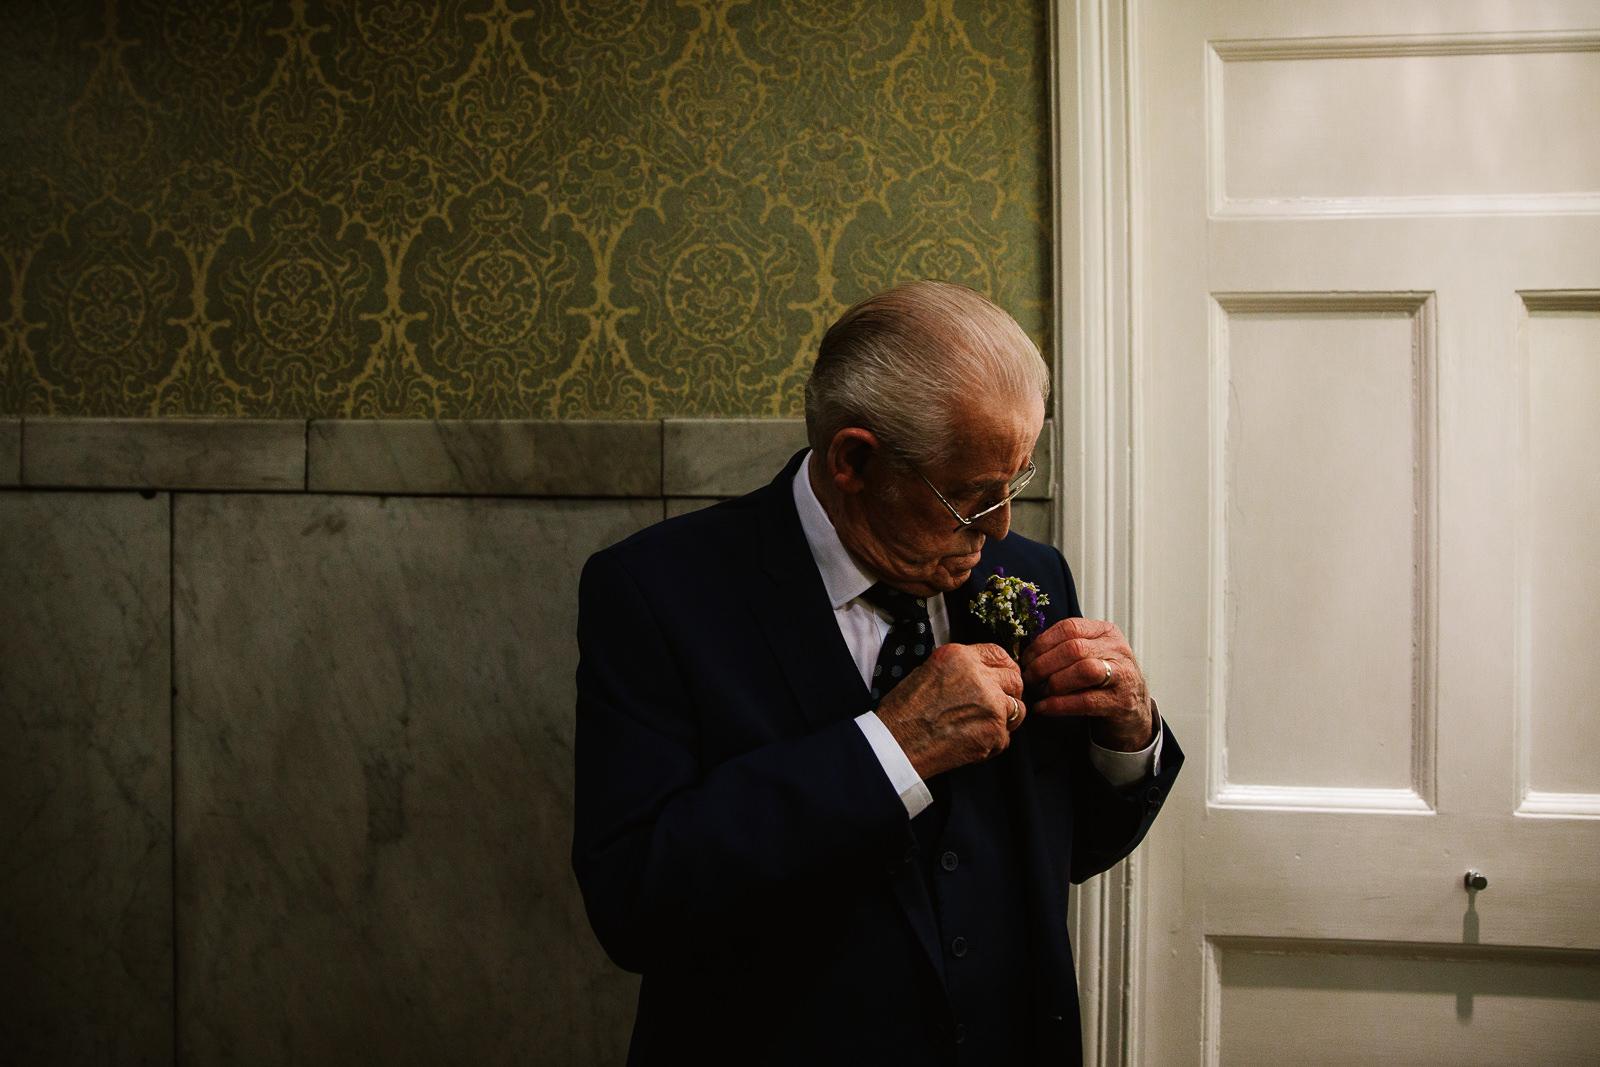 Grandad turns up at brides hotel room